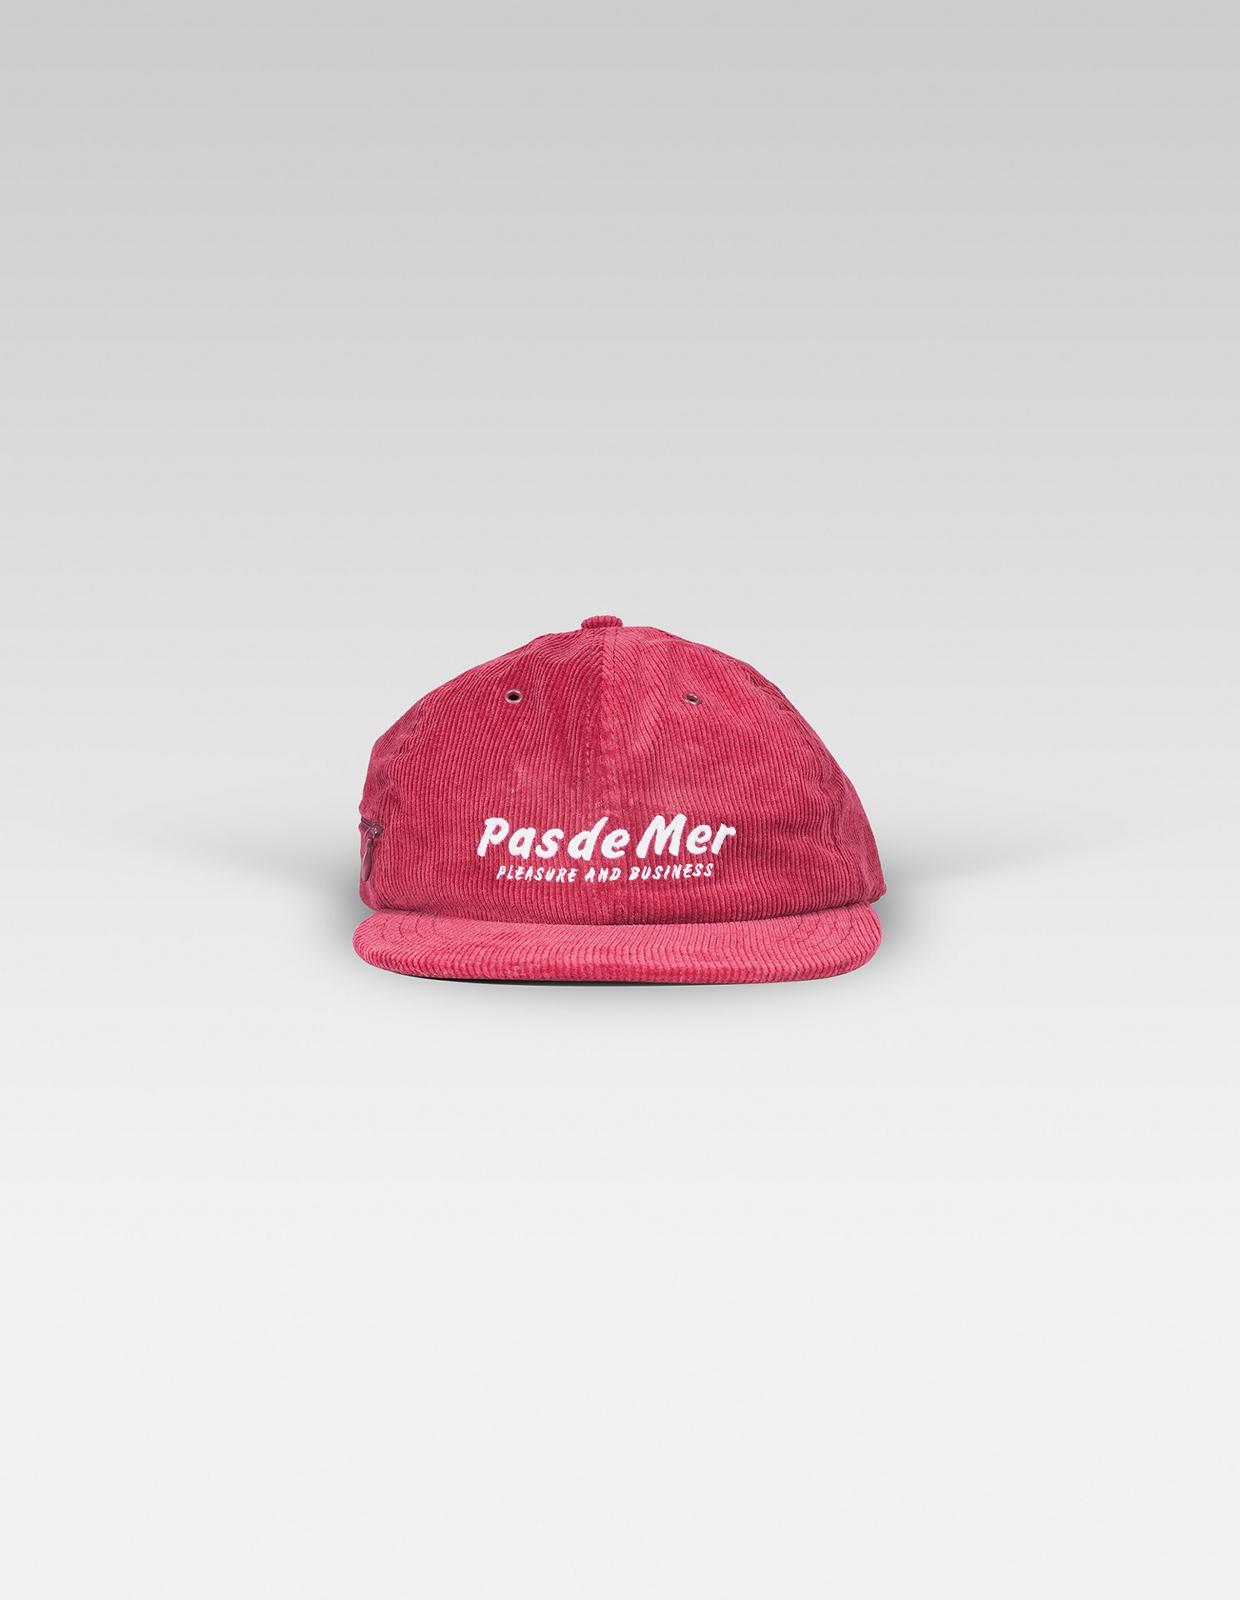 【PAS DE MER/パドゥメ】PLEASURE AND BUSINESS CAP ストラップバックキャップ / BURGUNDY